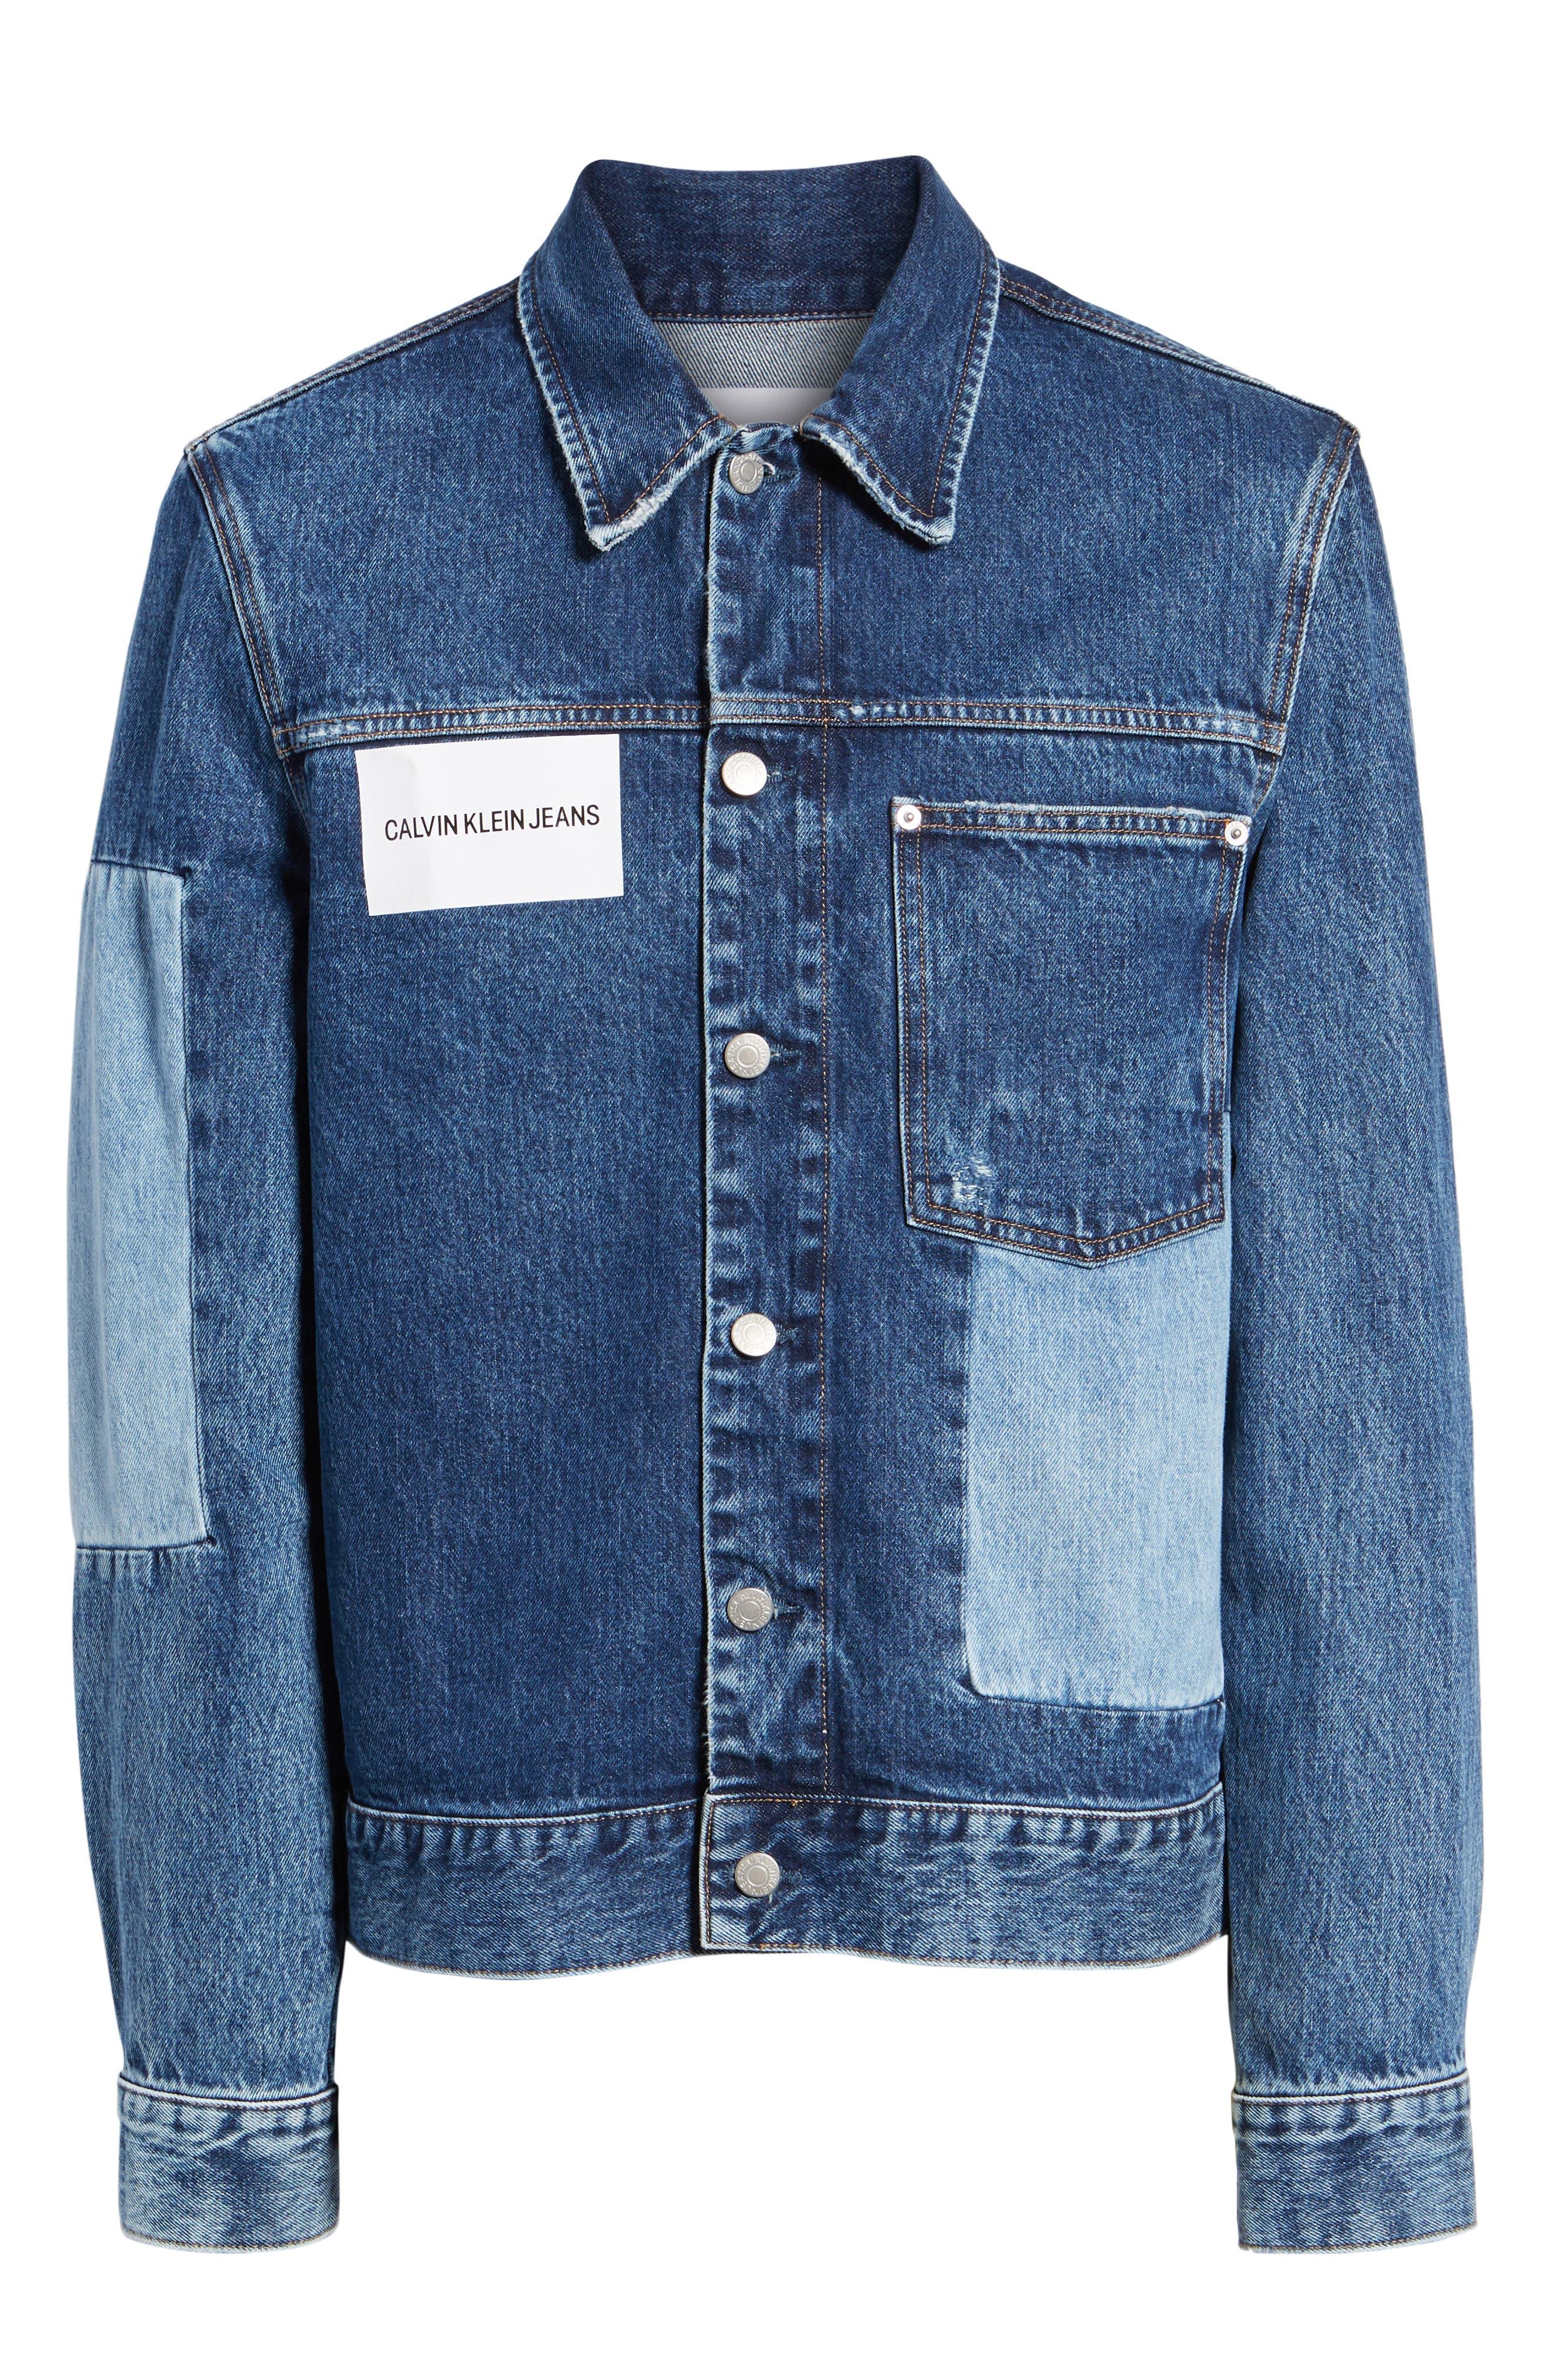 CALVIN KLEIN JEANS,                             Patch One-Pocket Denim Jacket,                             Alternate thumbnail 6, color,                             400